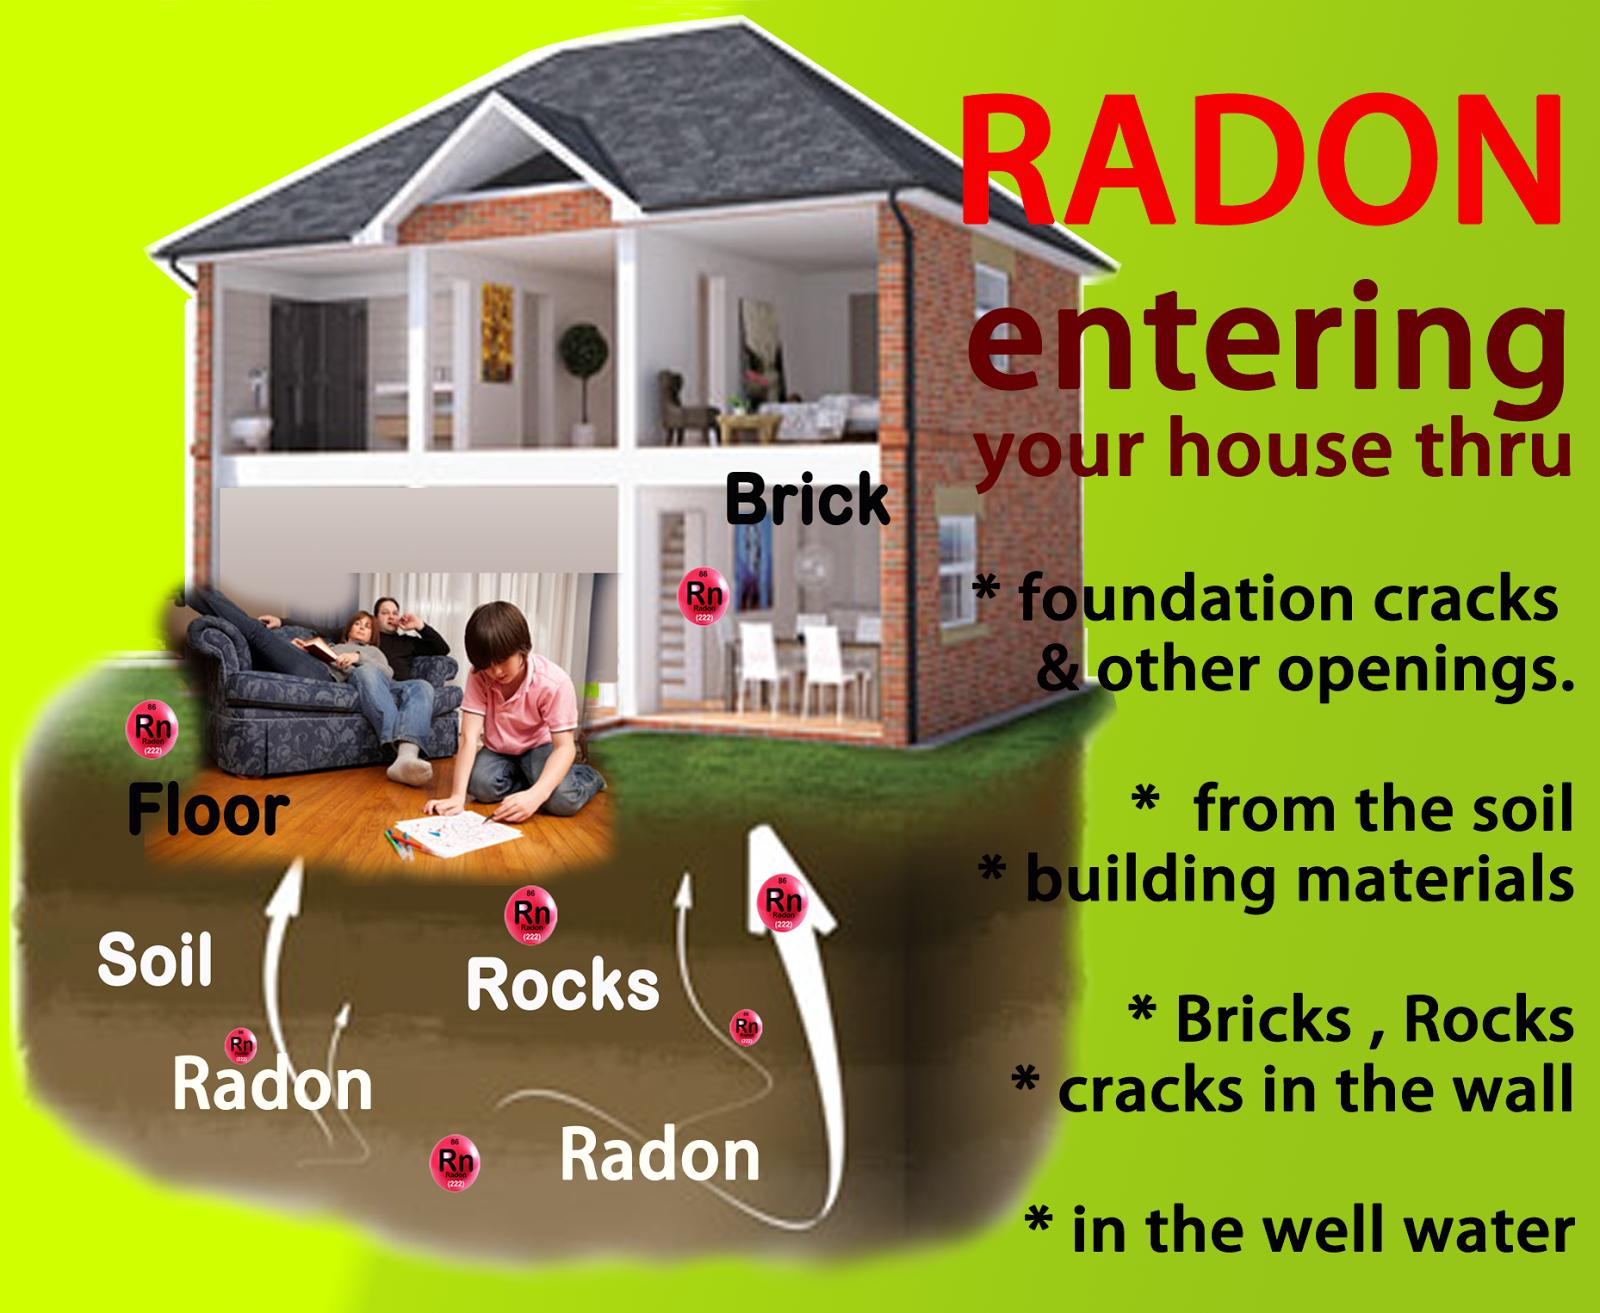 Indoor Radiation Environmental Radiation Radon Is A